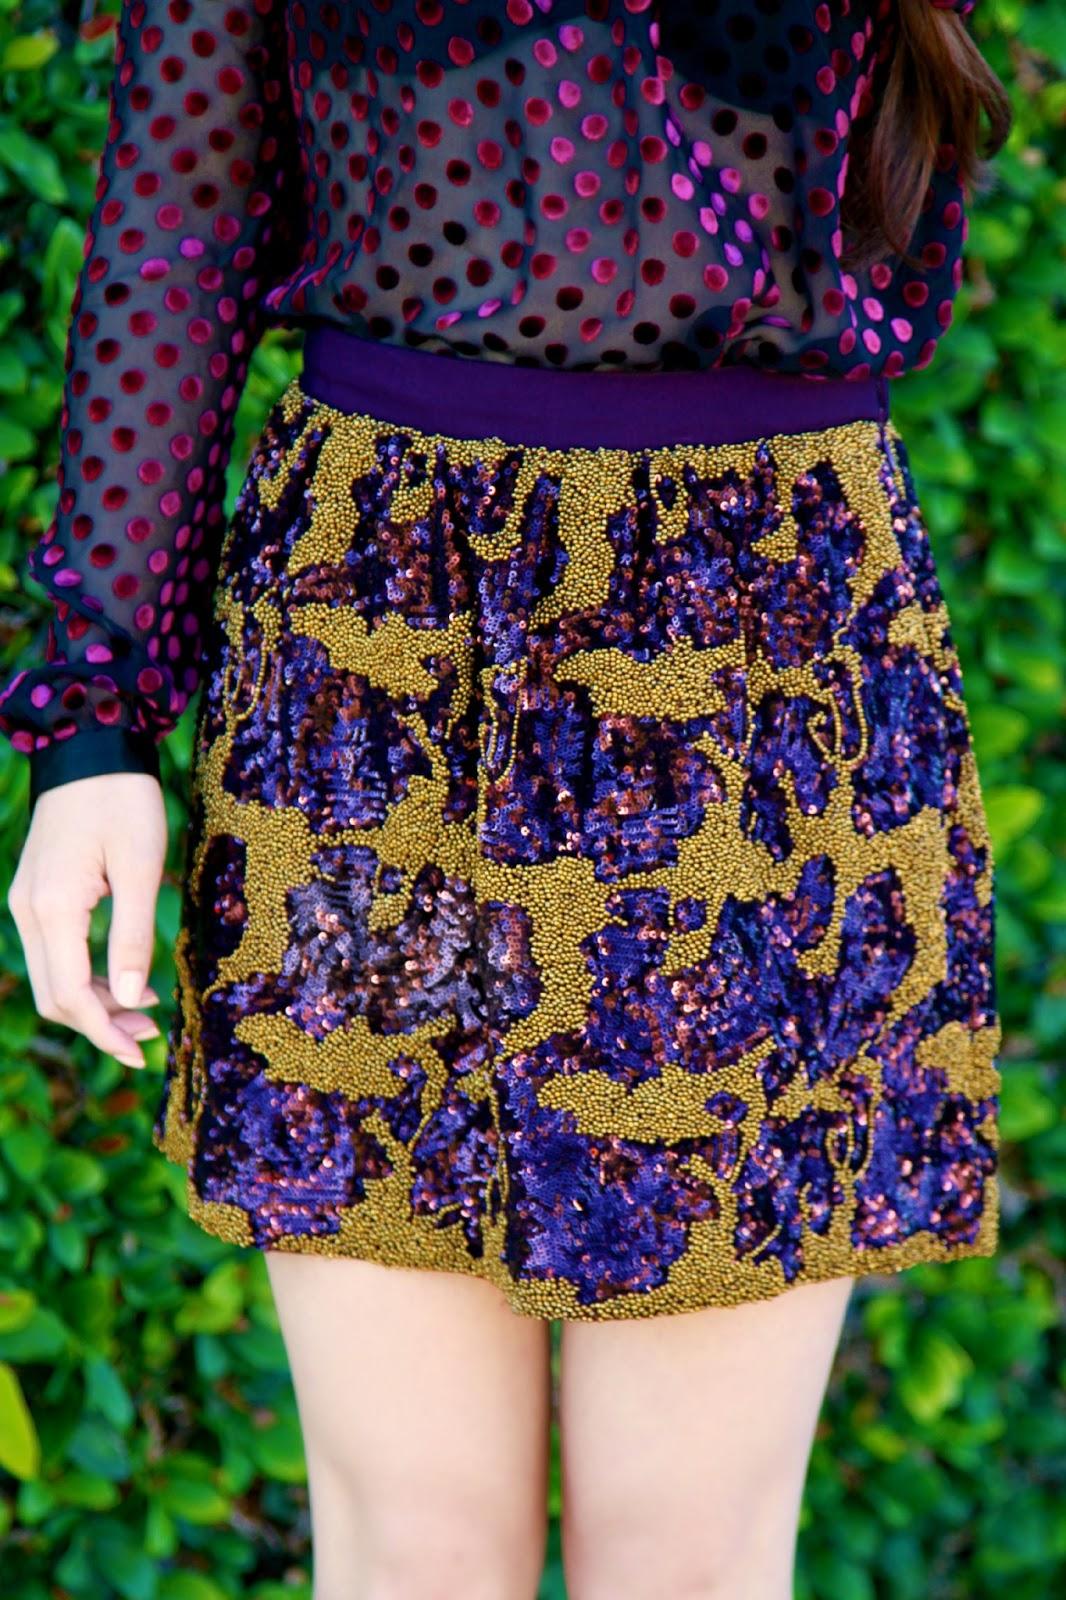 velvet and sequins